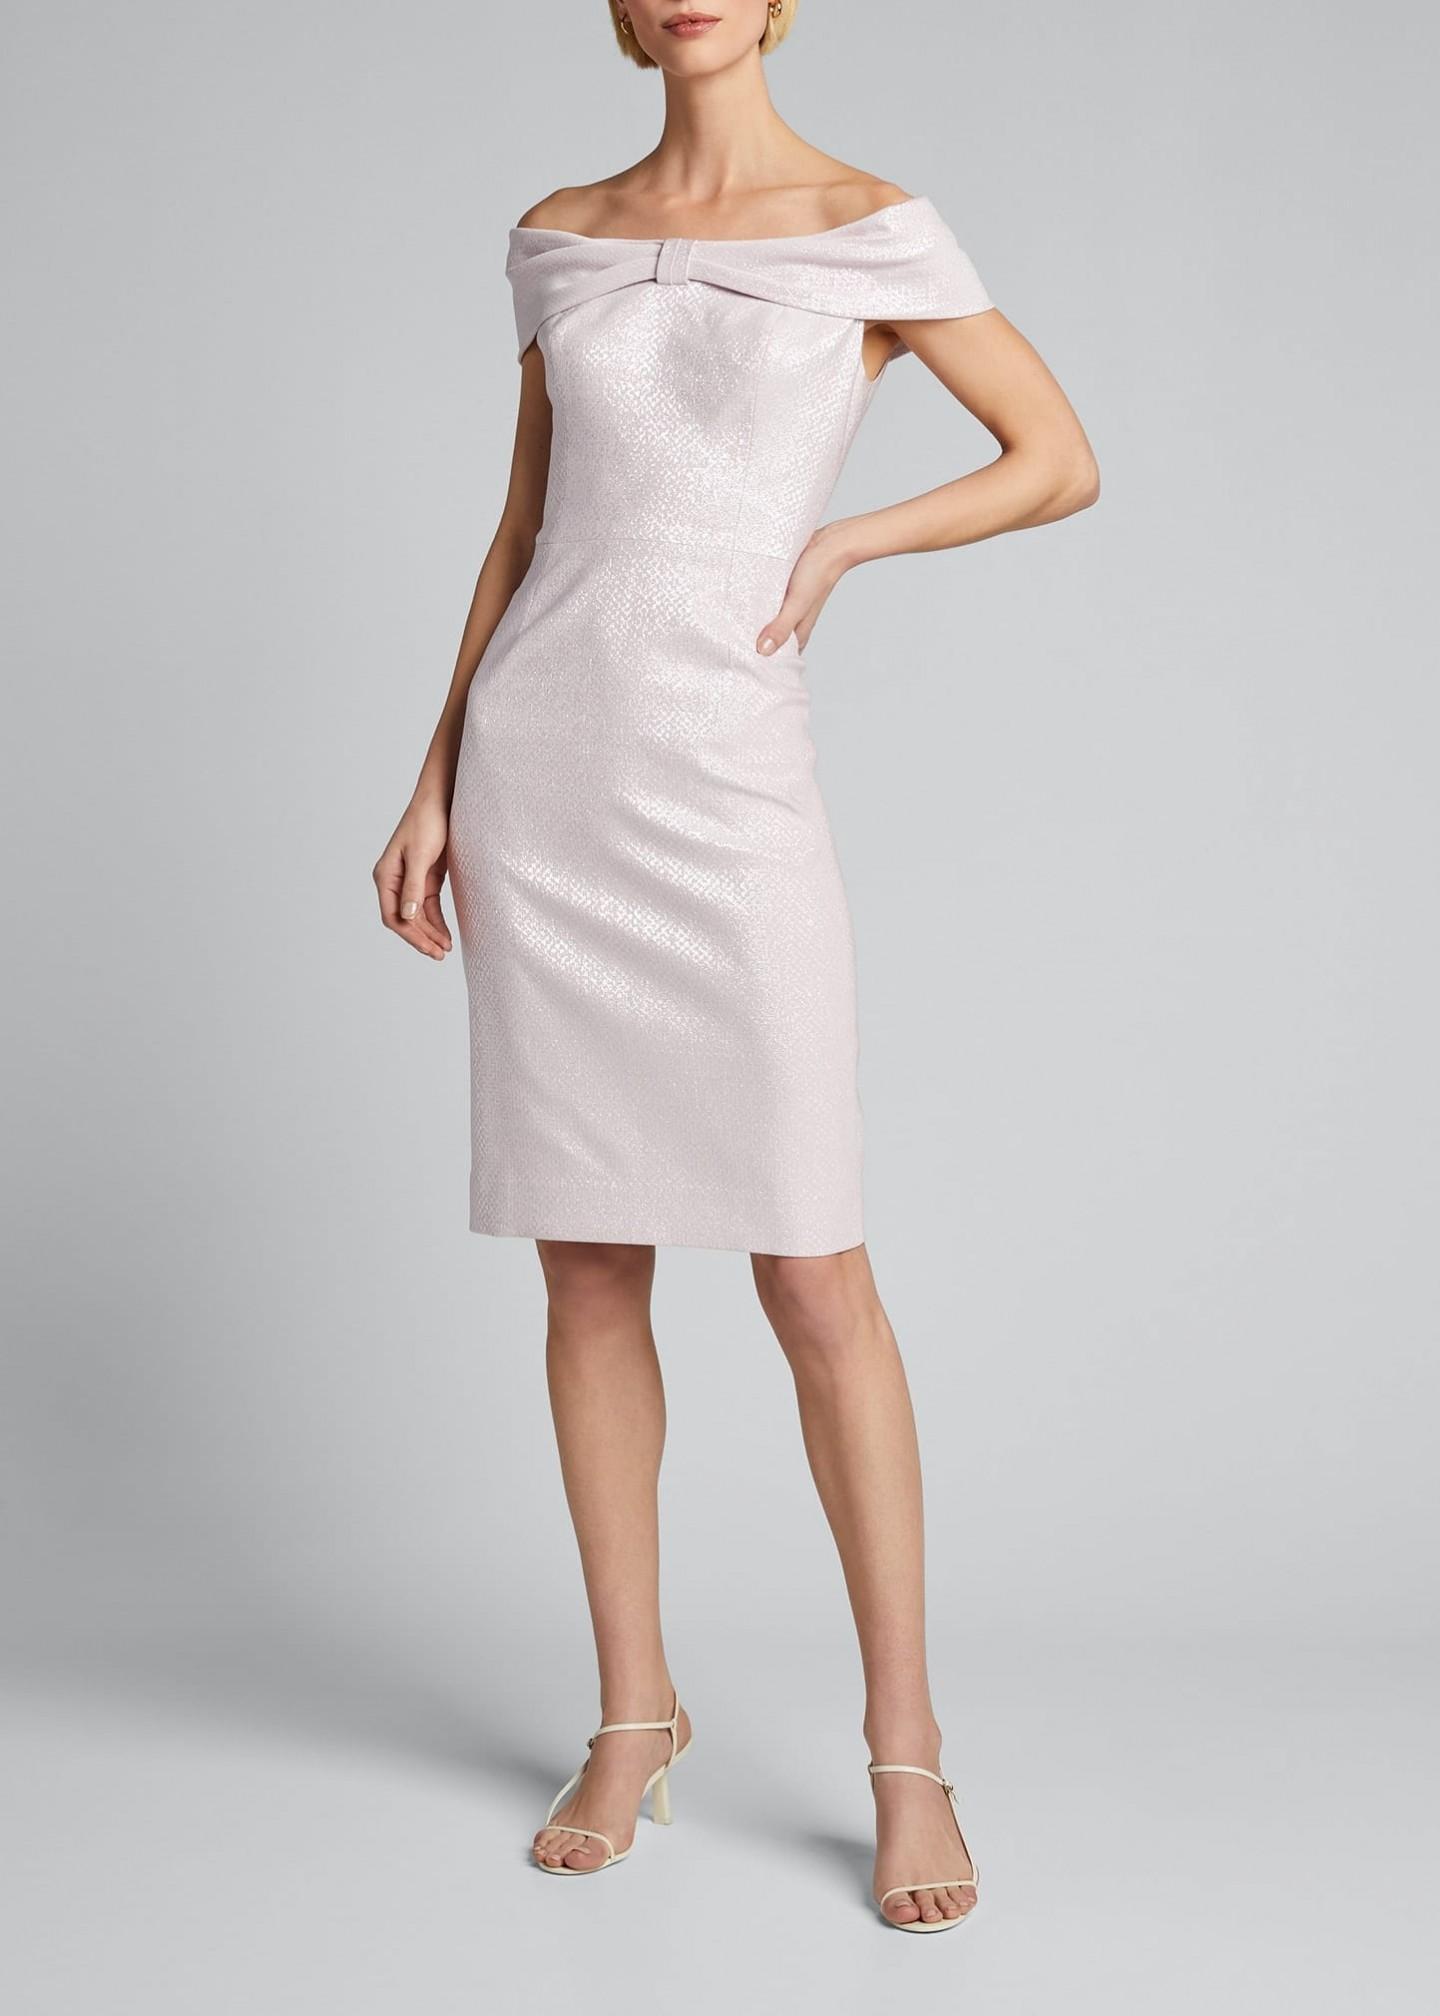 RICKIE FREEMAN FOR TERI JON Off-the-Shoulder Bow-Front Stretch Metallic Sheath Dress